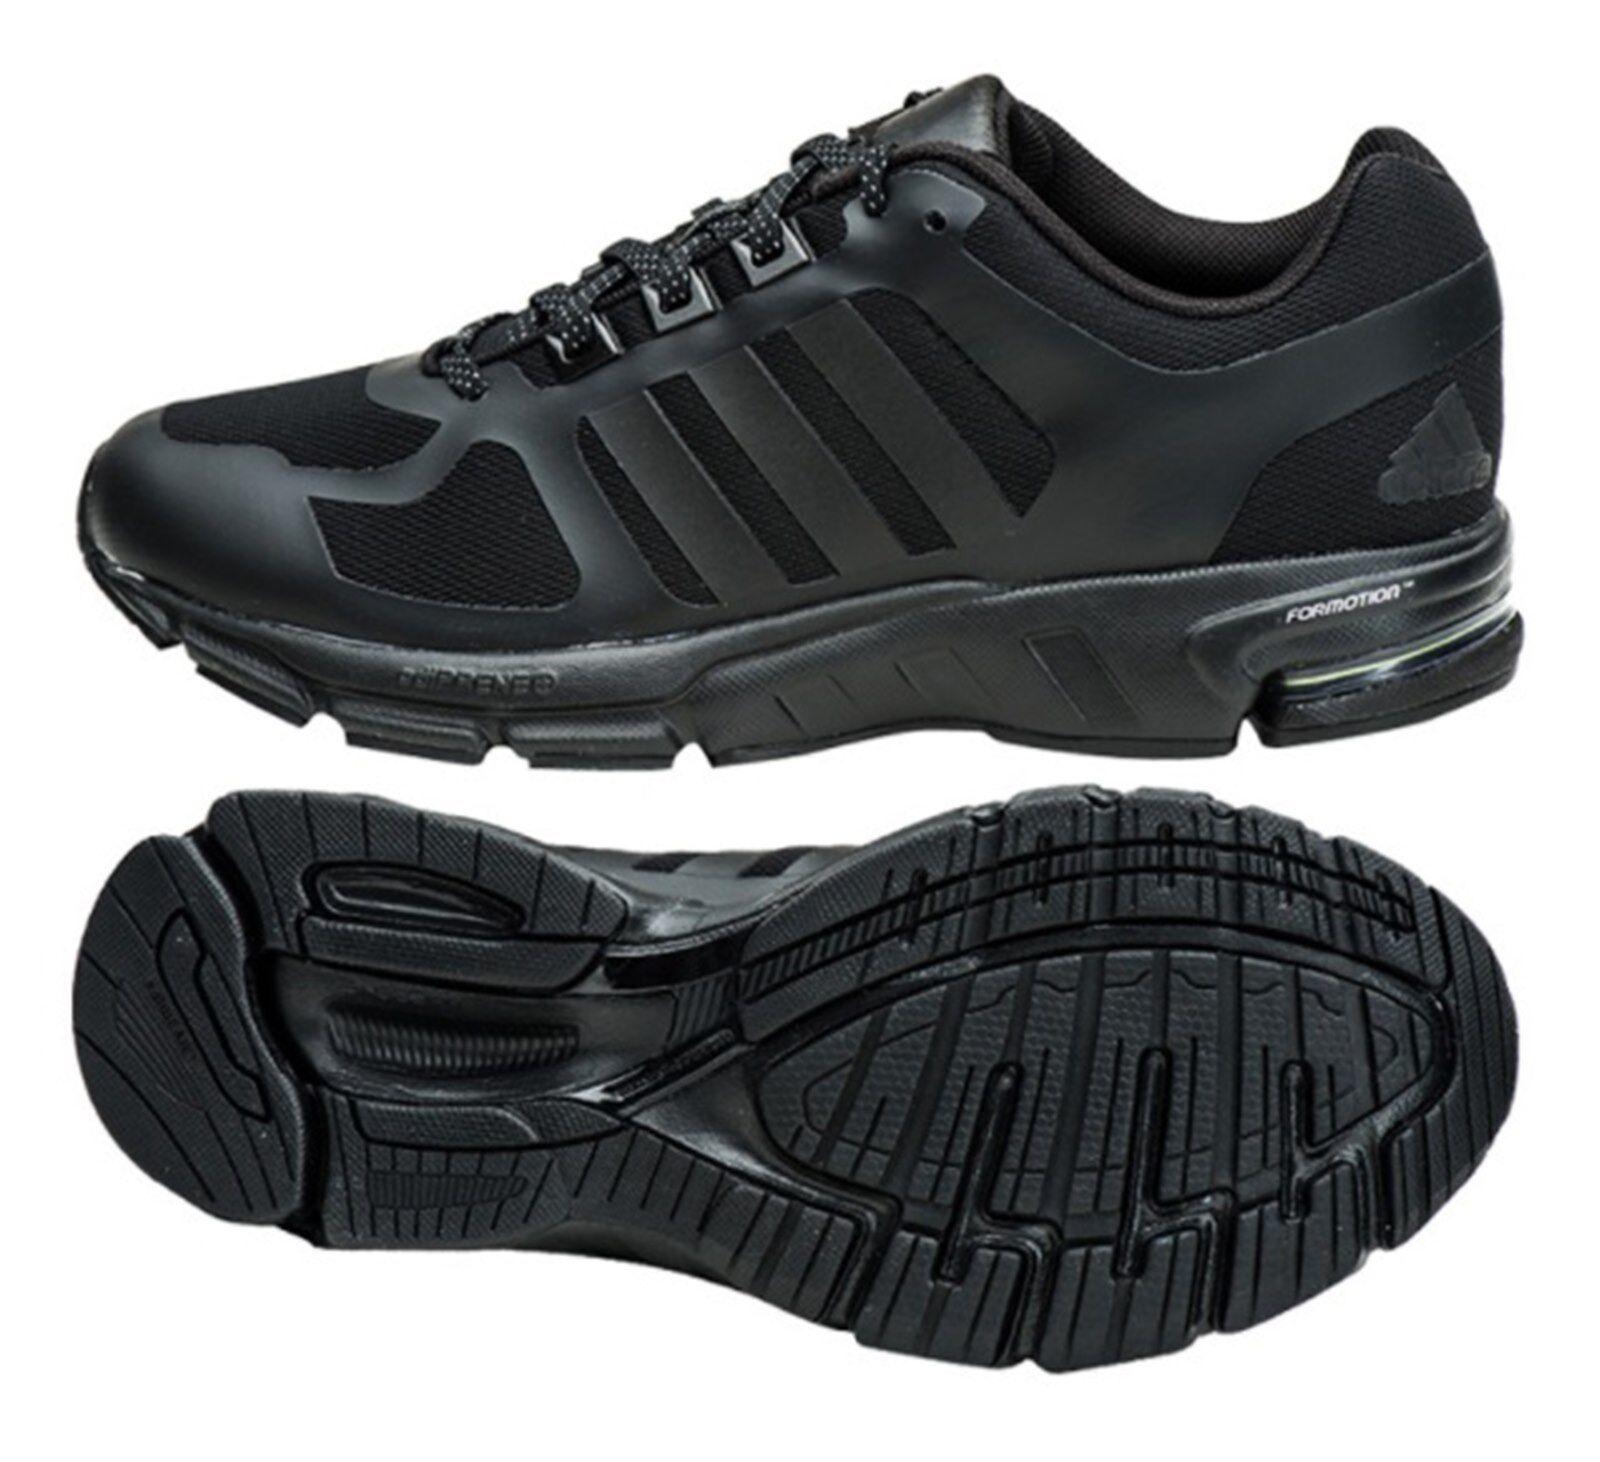 Adidas Zapatos para hombres equipo 10 Zapatillas De Entrenamiento Negro correr tactiles Zapato DA9359